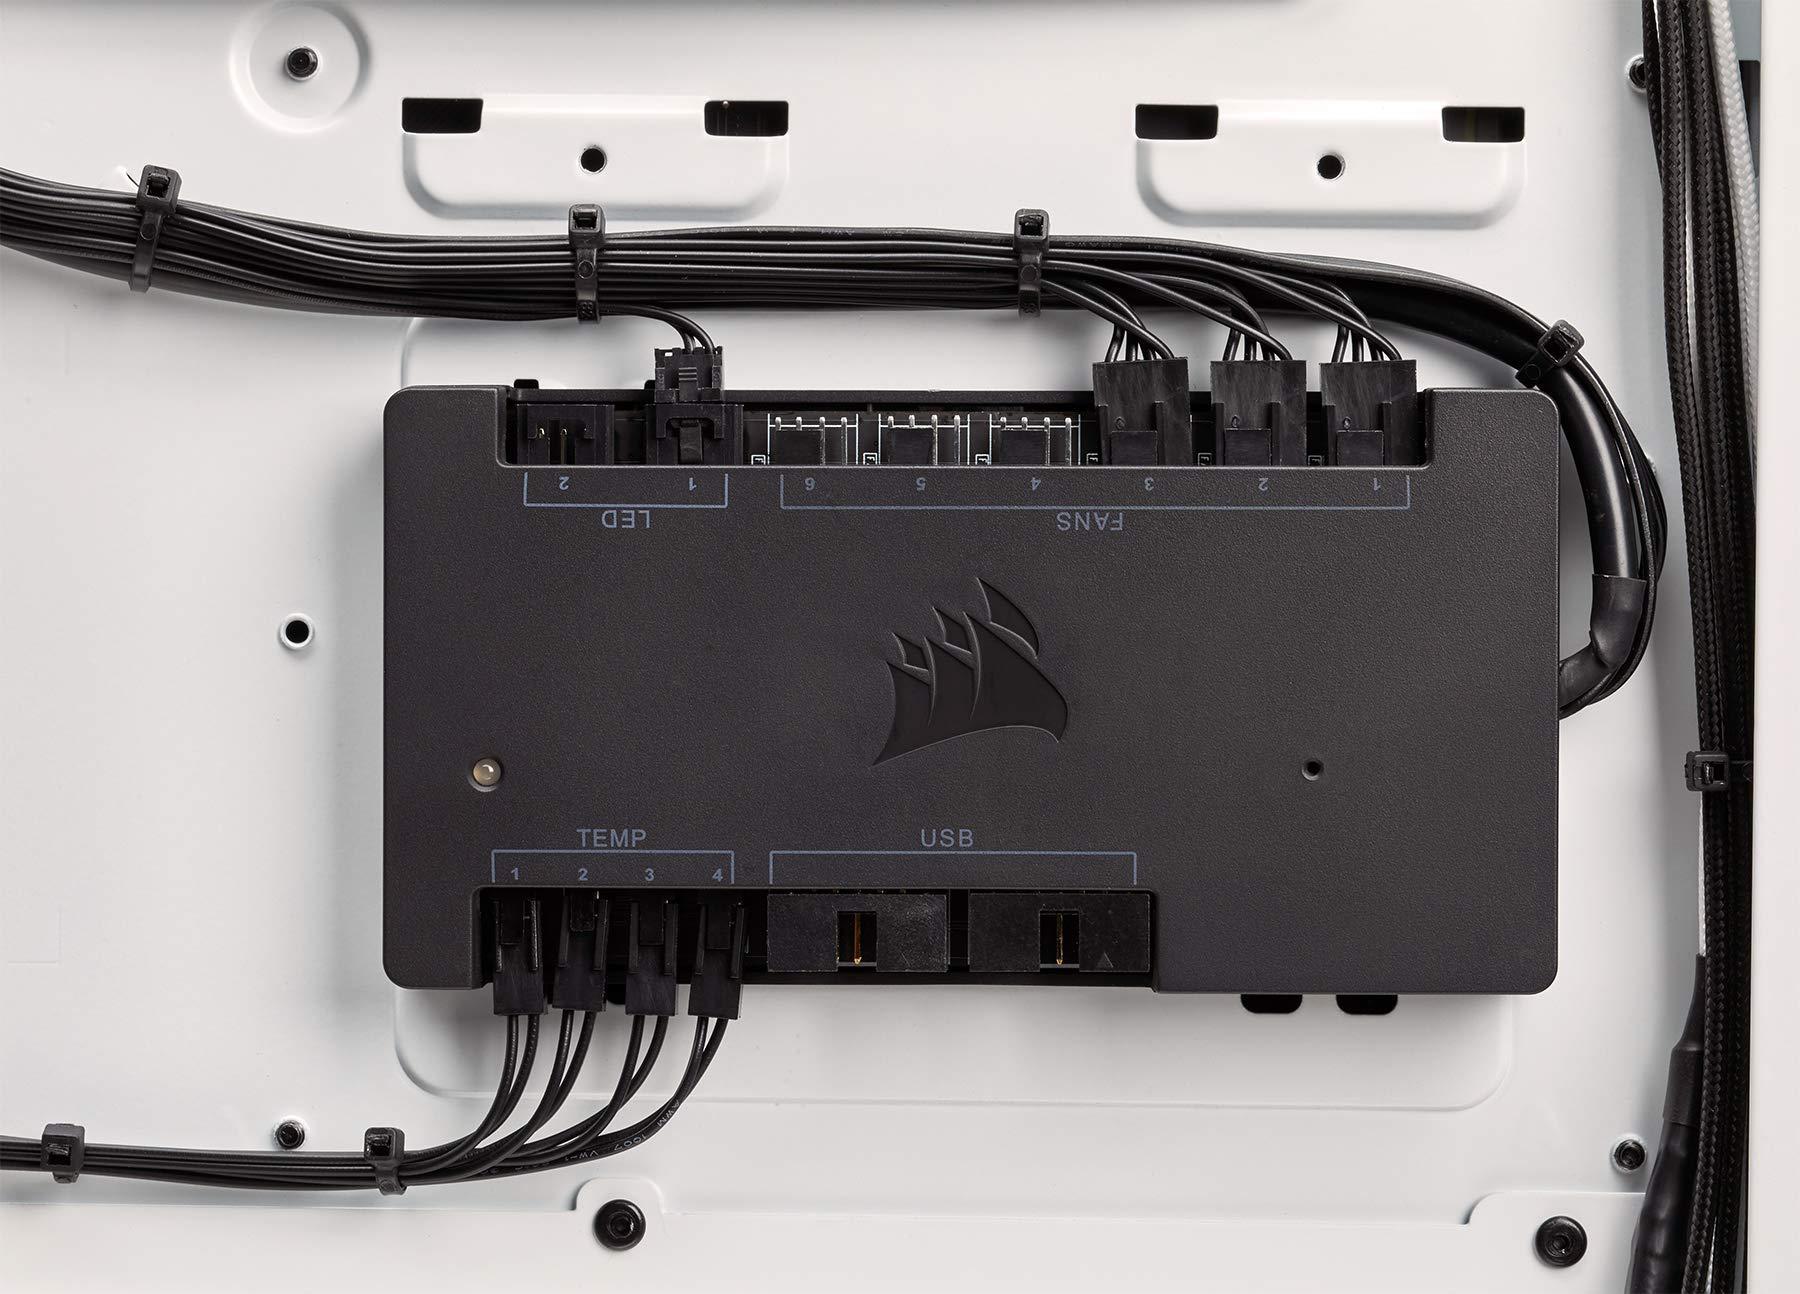 CORSAIR LL Series, LL120 RGB, 120mm RGB LED Fan, Triple Pack with Lighting Node PRO- White by Corsair (Image #6)